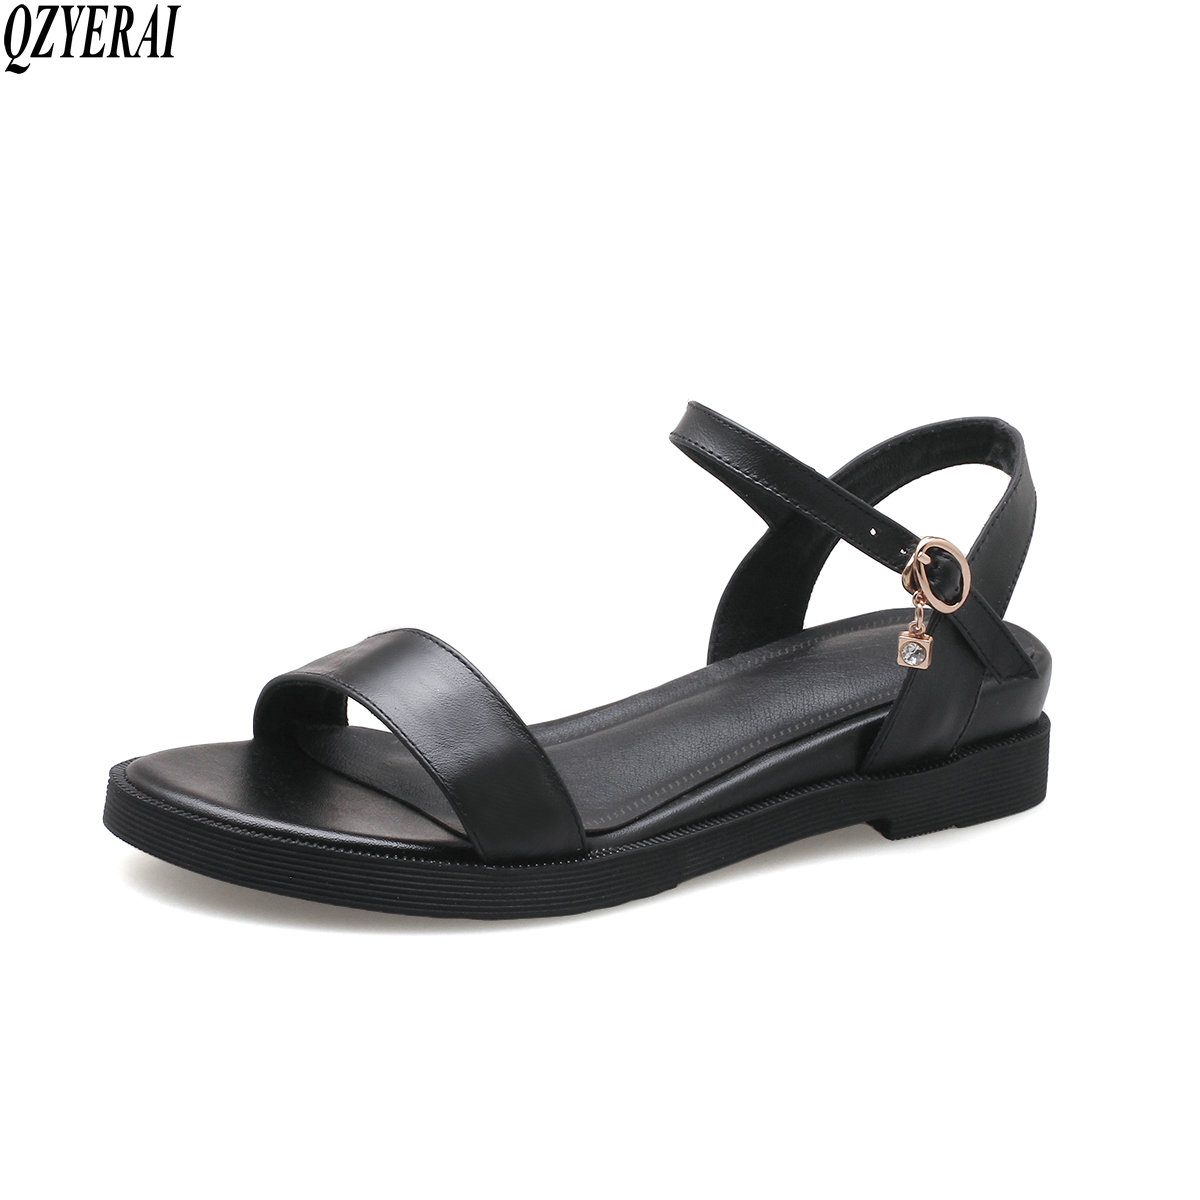 QZYERAI Summer new girls' sandals 100% leather sandals fashionable women's shoes sweats breathable cool women's shoes qzyerai new to summer summer sexy